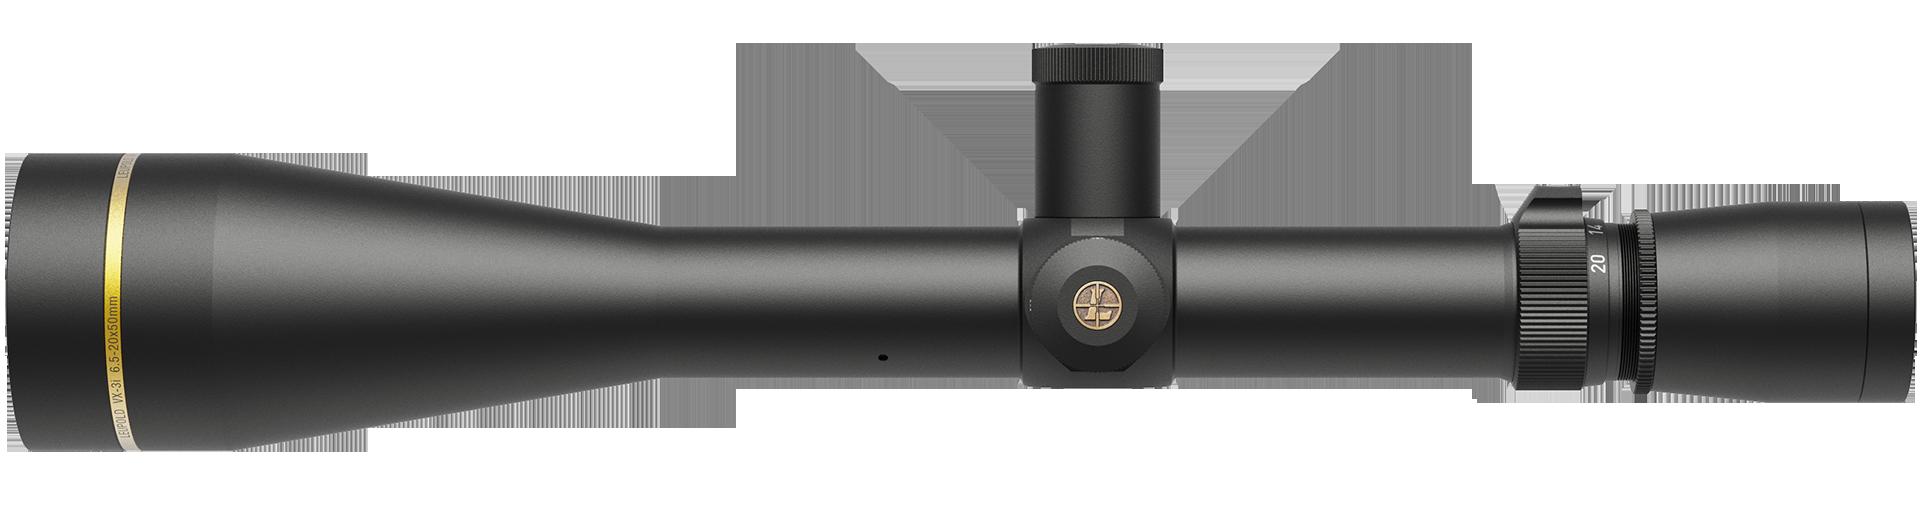 6.5-20x50mm